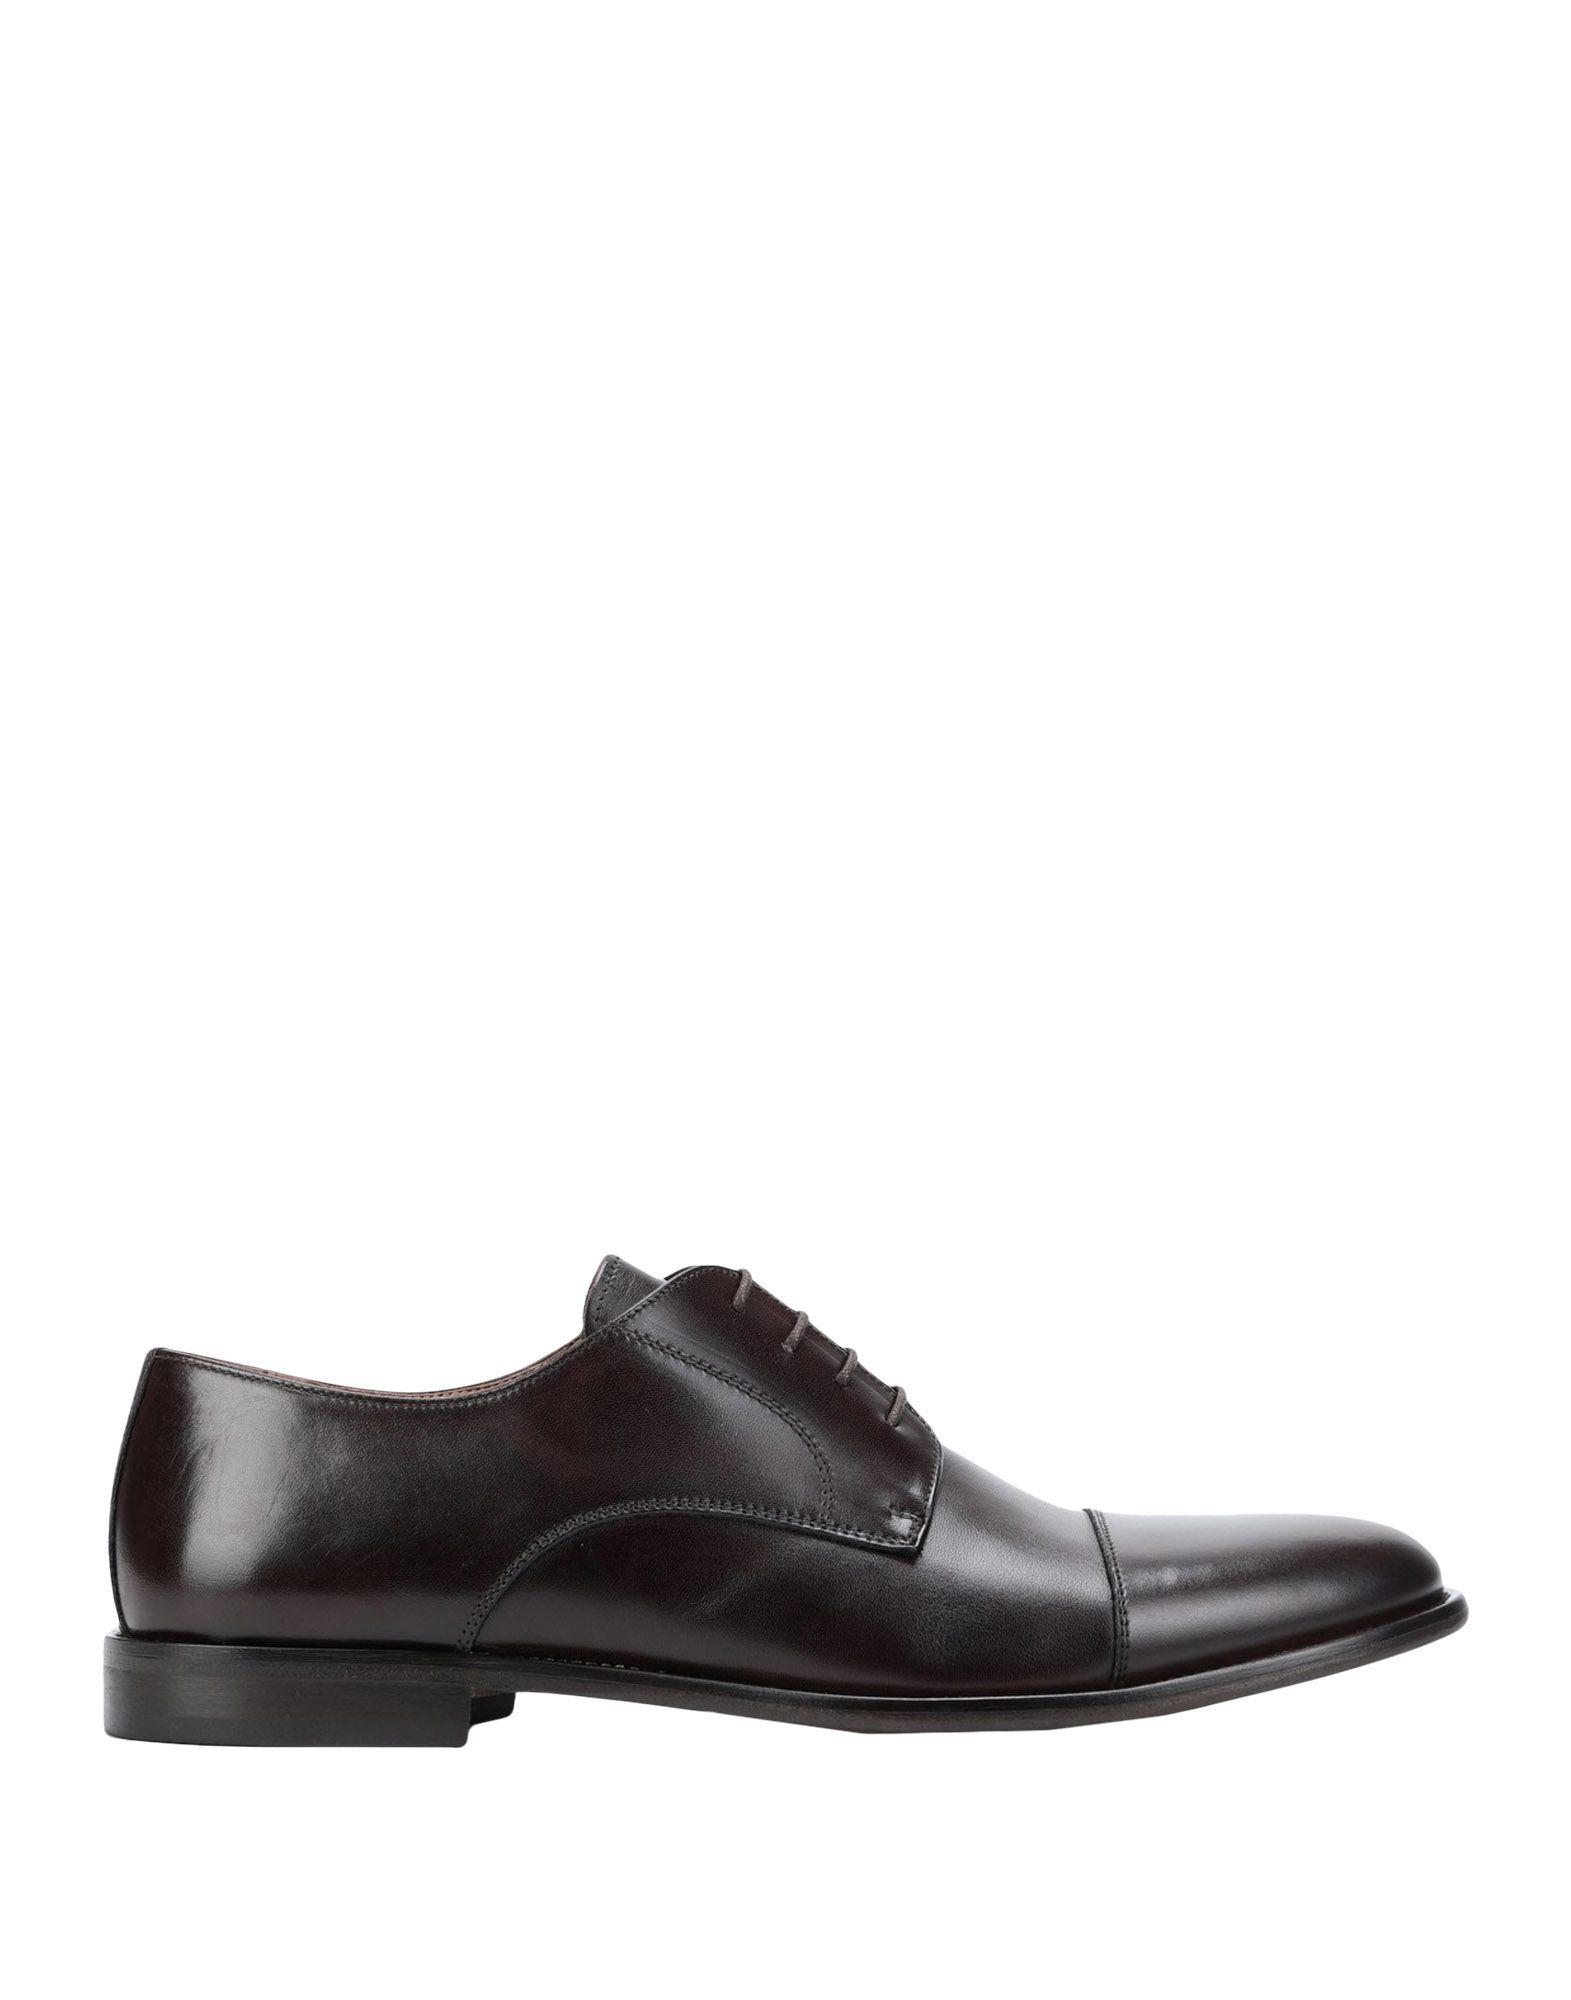 Фото - MALDINI Обувь на шнурках обувь на высокой платформе dkny